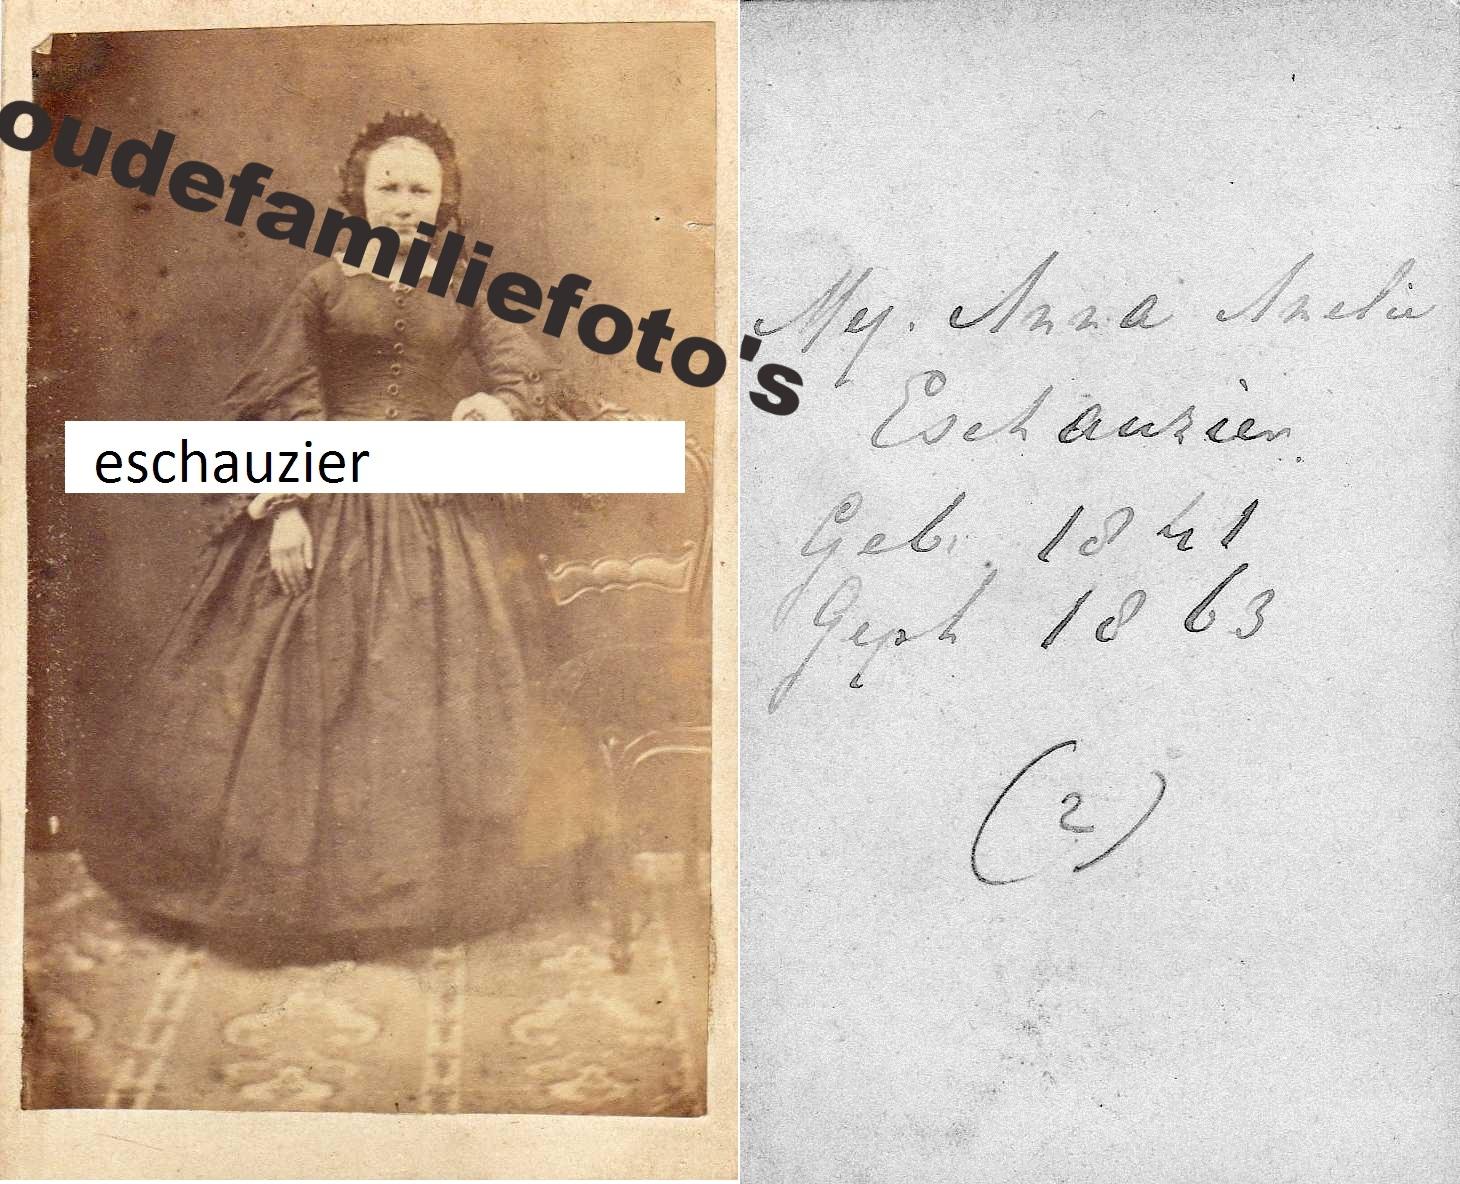 Eschauzier, Anne Amelia geb: 9-4-1841 Terschelling. ouders Willem Samuel Louis en Neeltje Gerrits Swart. € notk